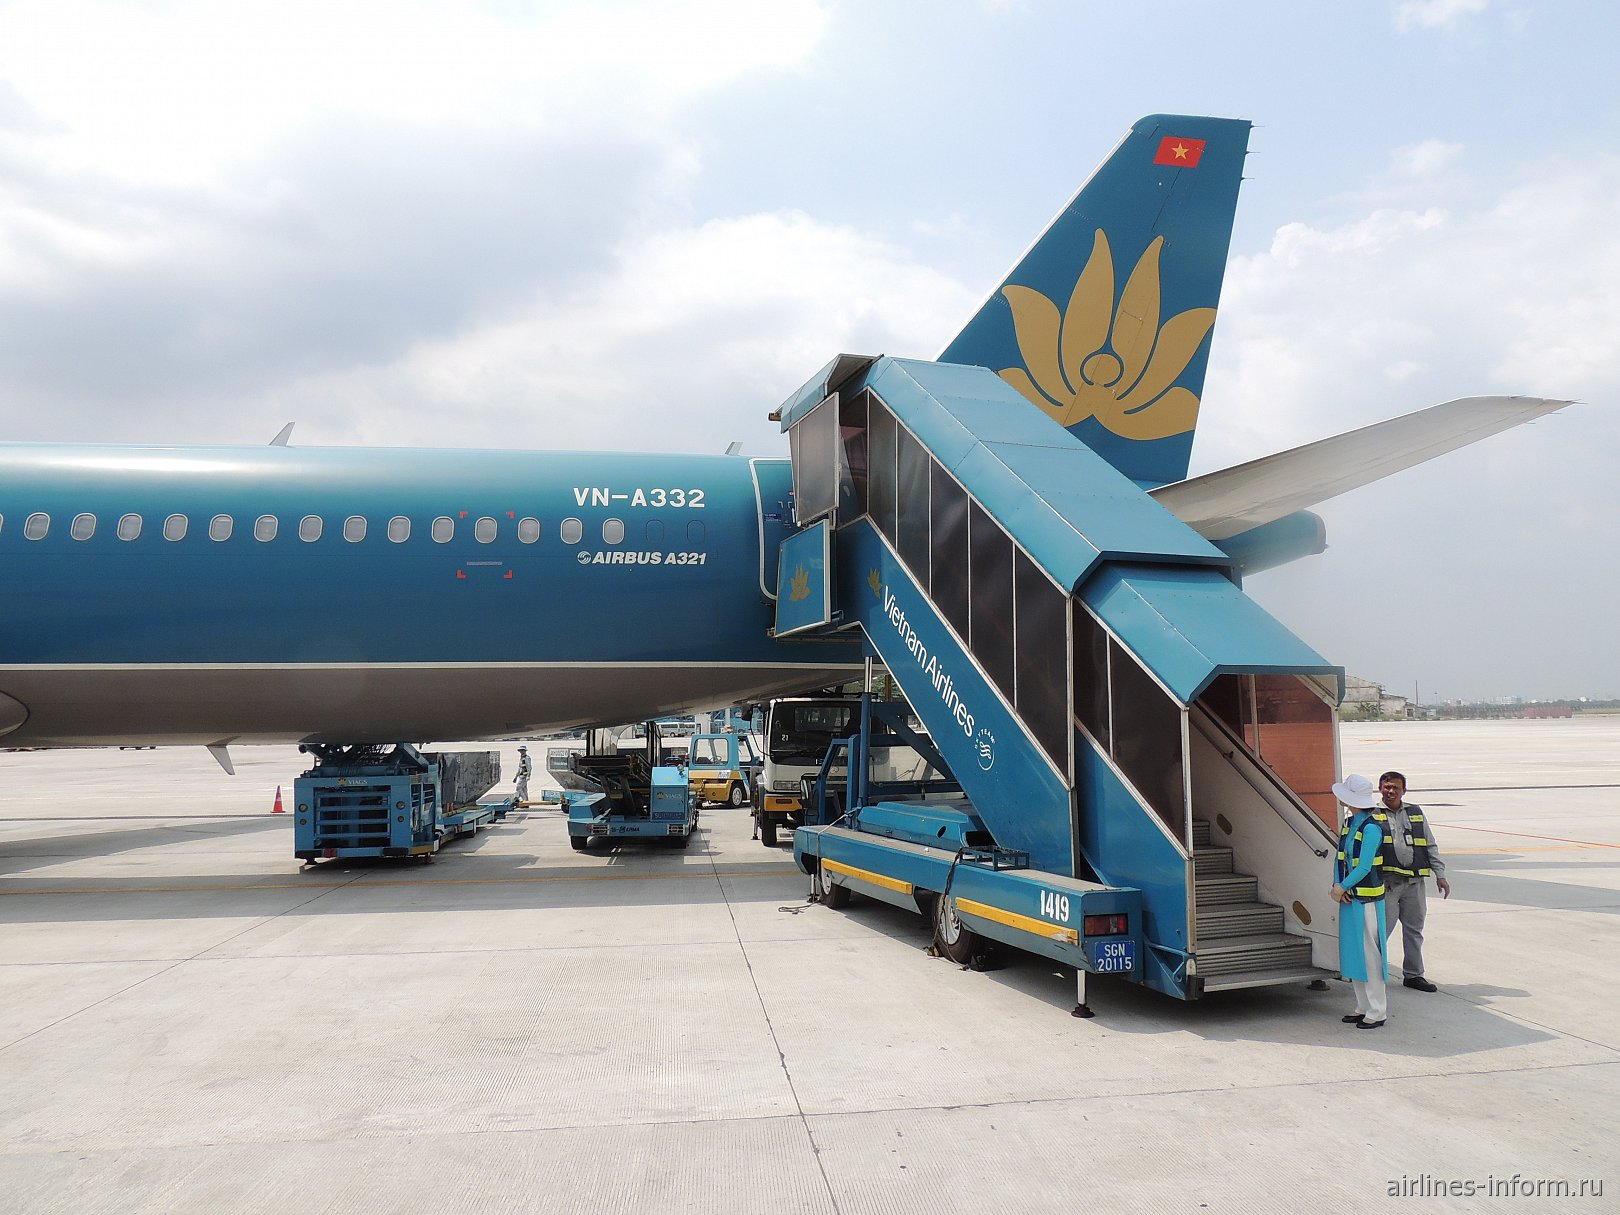 Бангкок - Хошимин с Vietnam Airlines